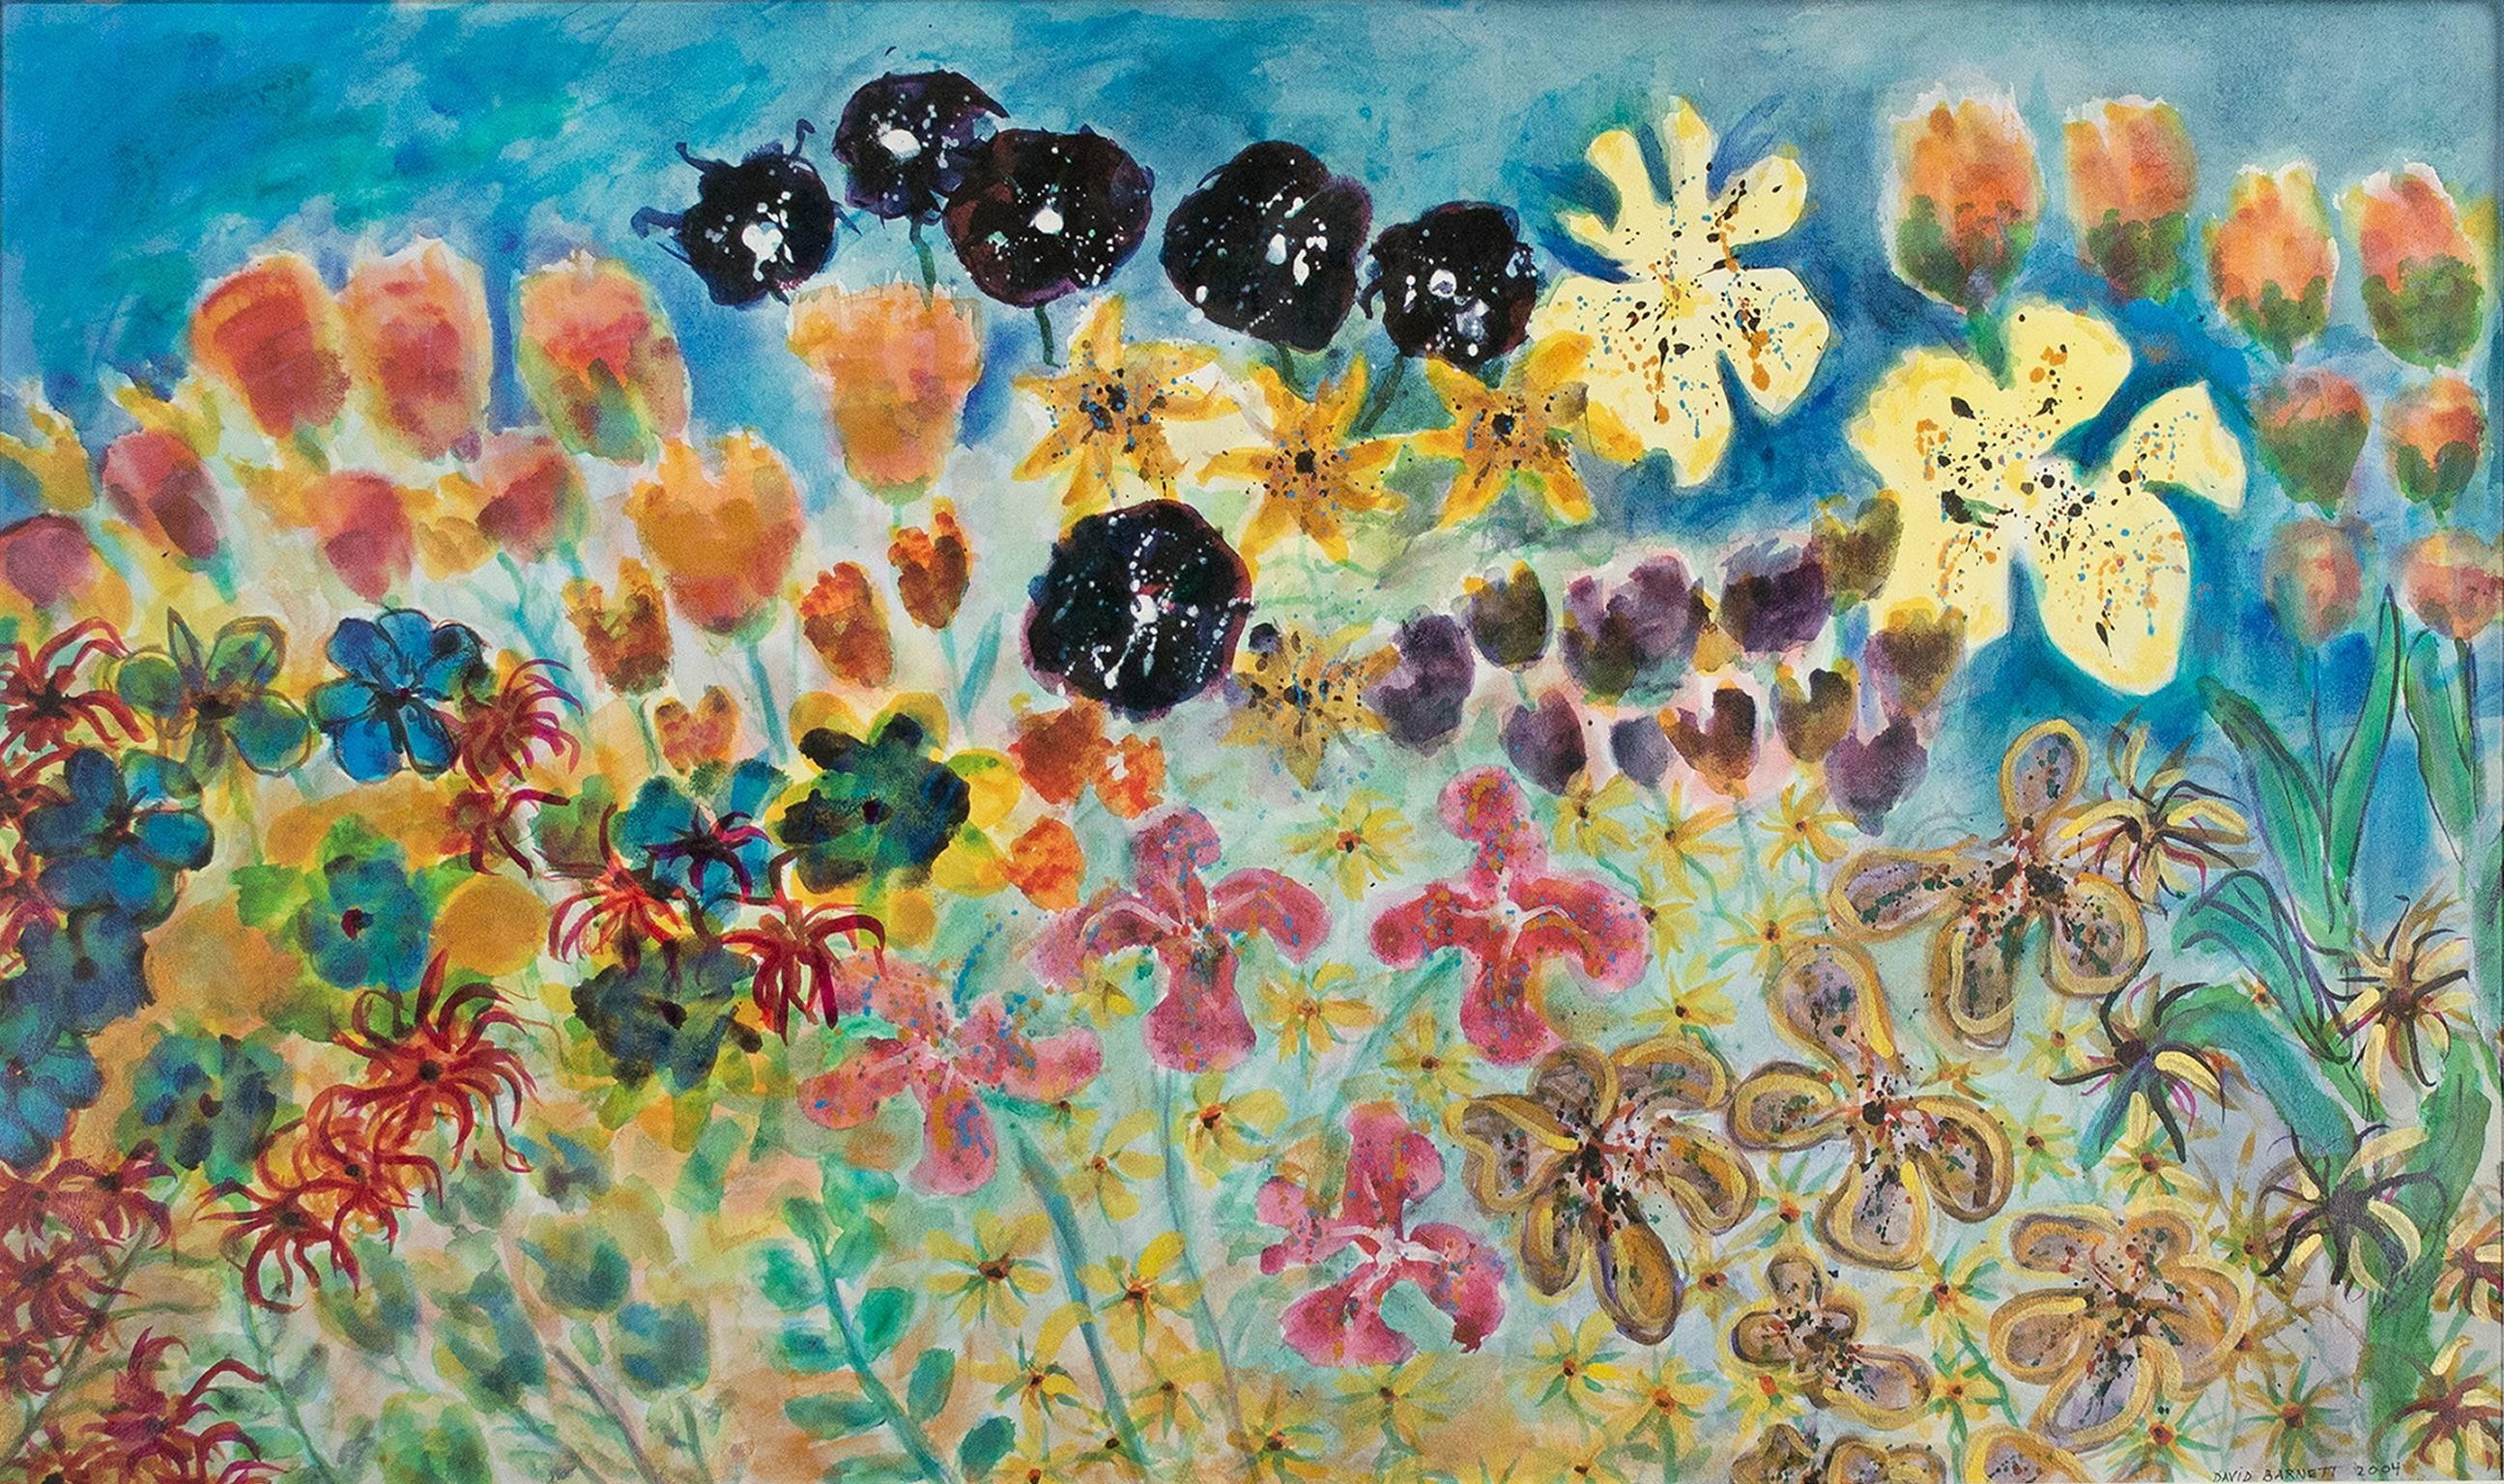 """Anticipating Spring,"" Original Mixed Media (Ink, Watercolor) by David Barnett"